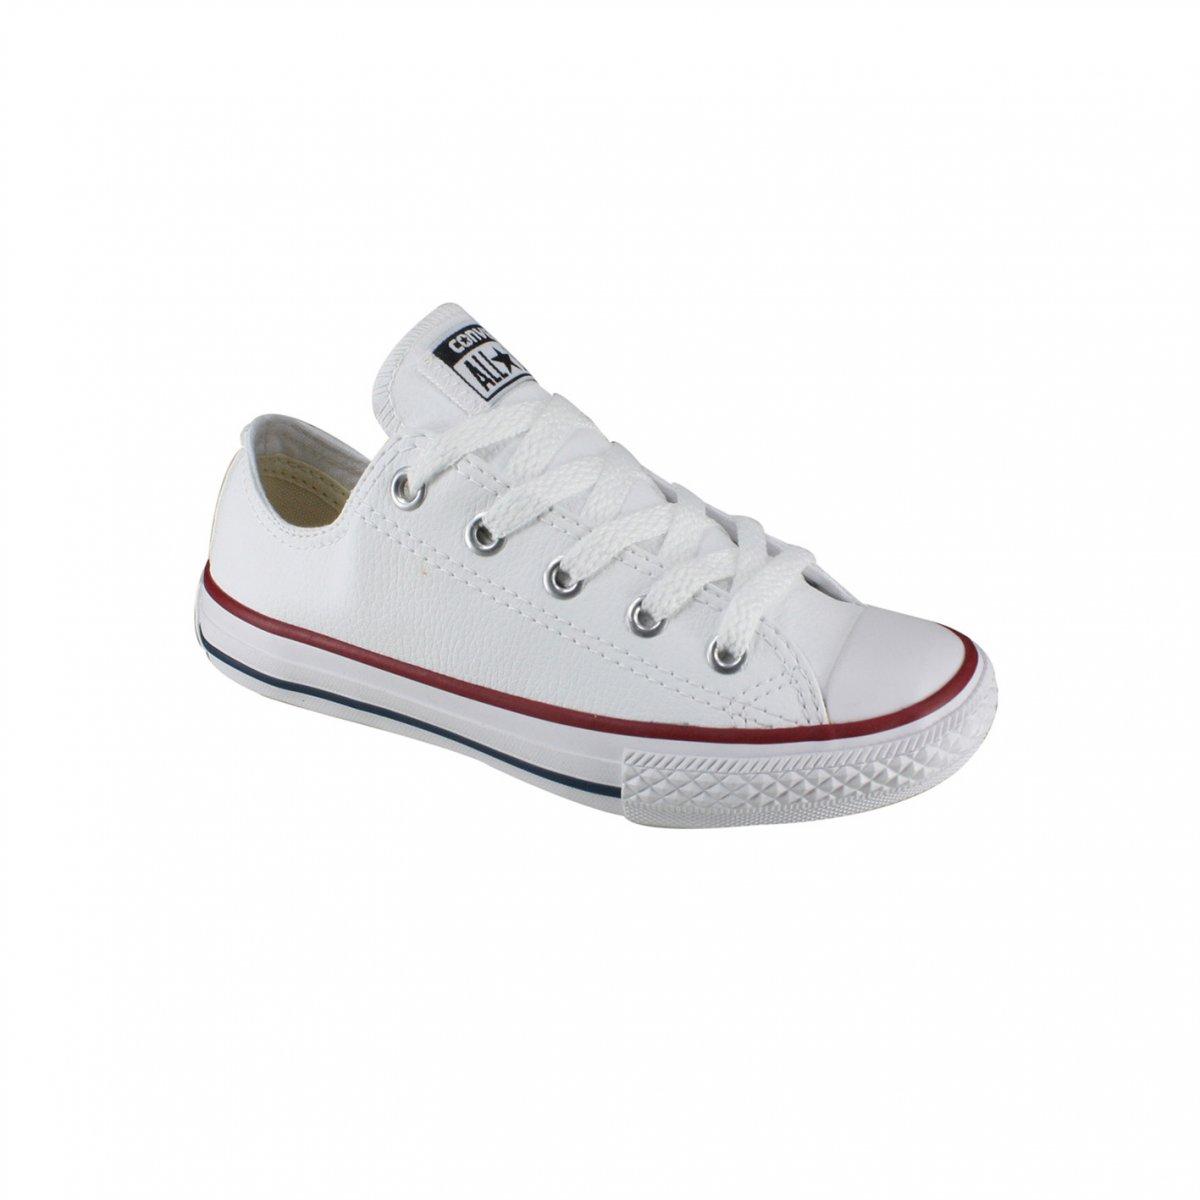 8b40018afca Tênis Infantil Converse - All Star CK0420 0001 - Branco - Calçados ...